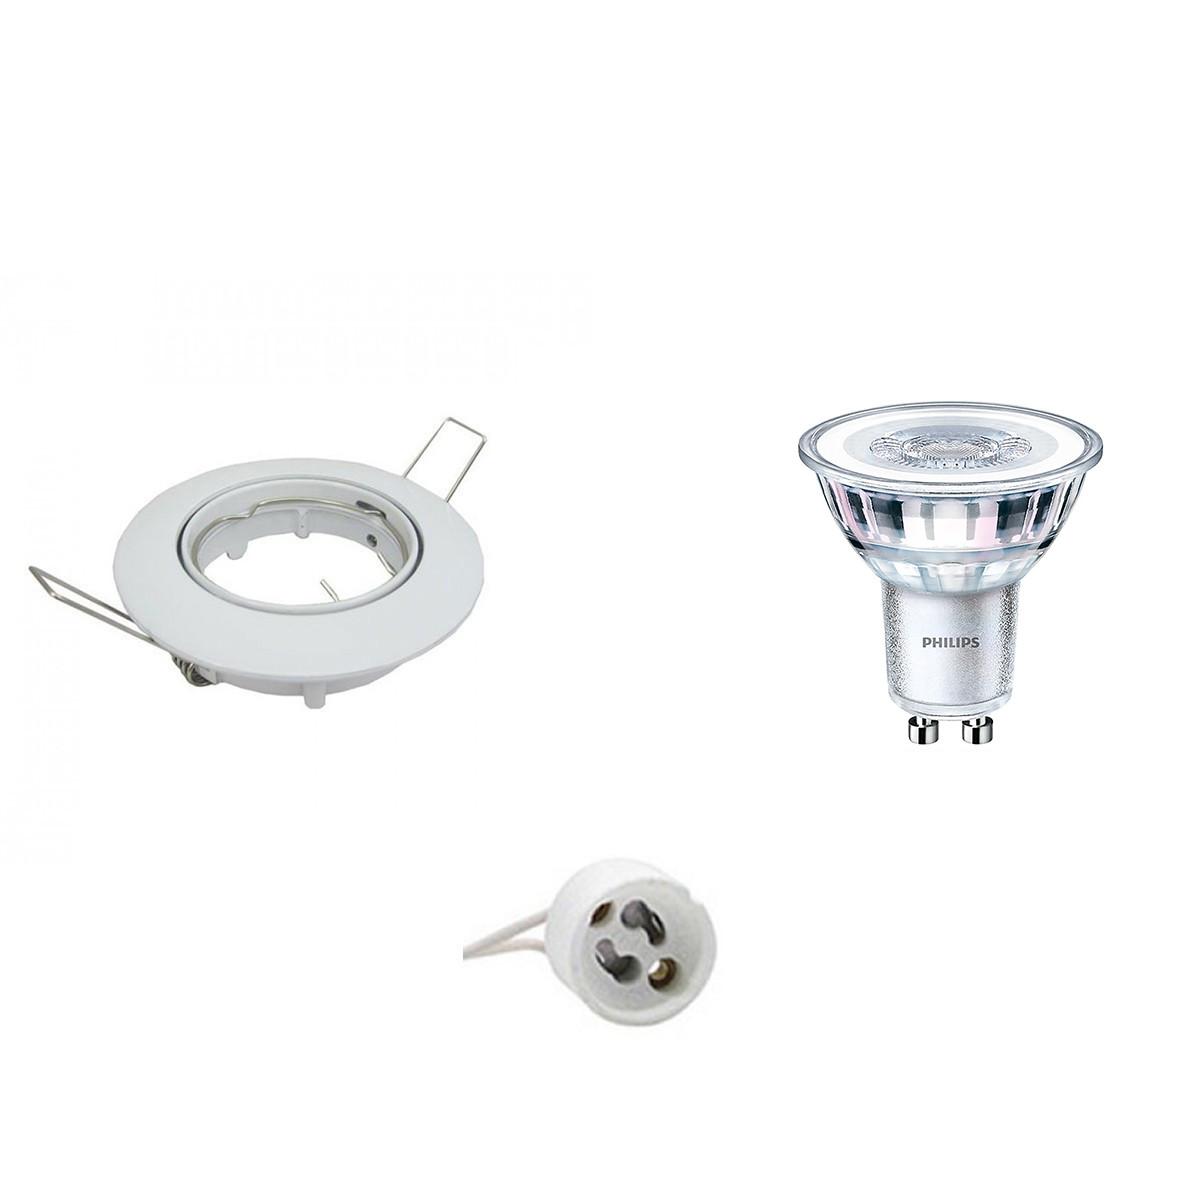 PHILIPS - LED Spot Set - CorePro 827 36D - GU10 Fitting - Dimbaar - Inbouw Rond - Glans Wit - 5W - W